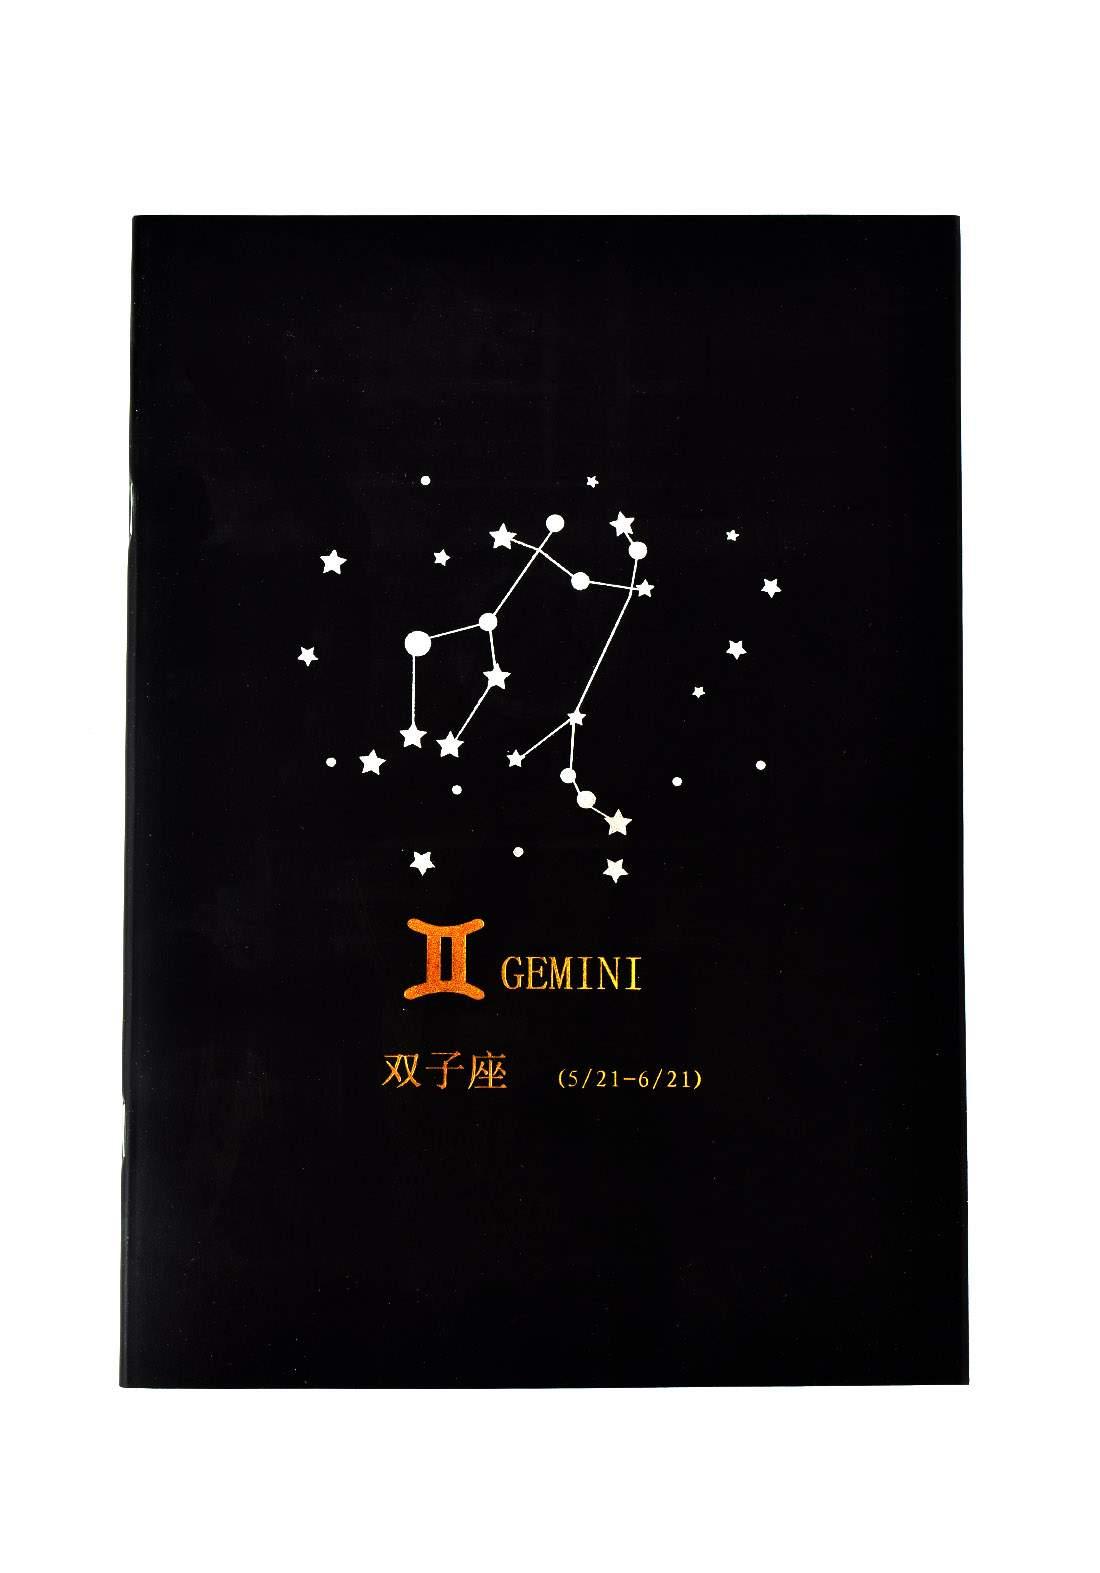 Big Black Drawing Book 24 Sheets-Gemini دفتر رسم اسود كبير بطبعة برج الجوزاء